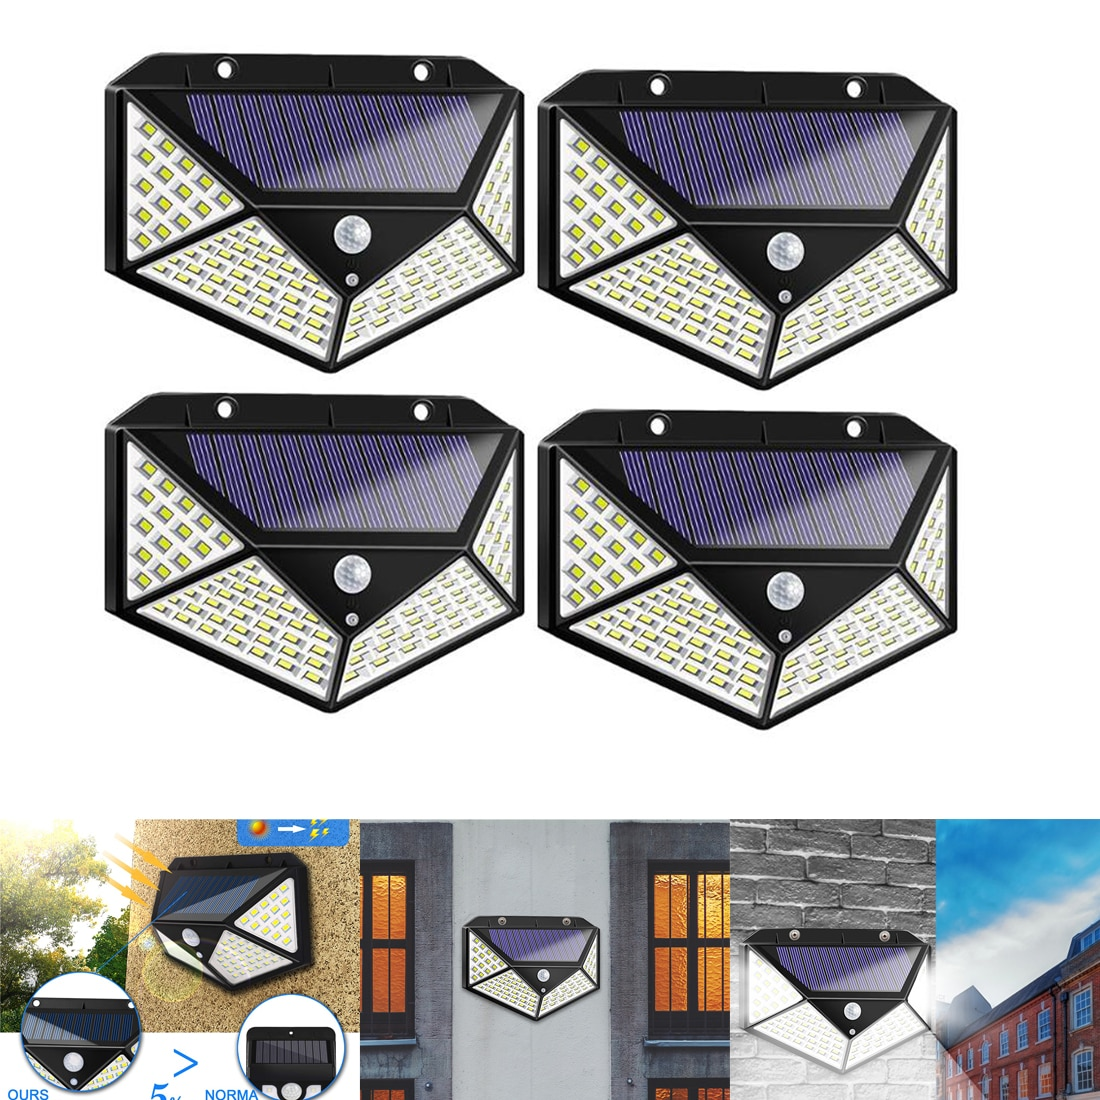 100/144 LED Luz de energía Solar 3 modos 120 grados sensor de movimiento lámpara de pared angular impermeable jardín al aire libre lámparas